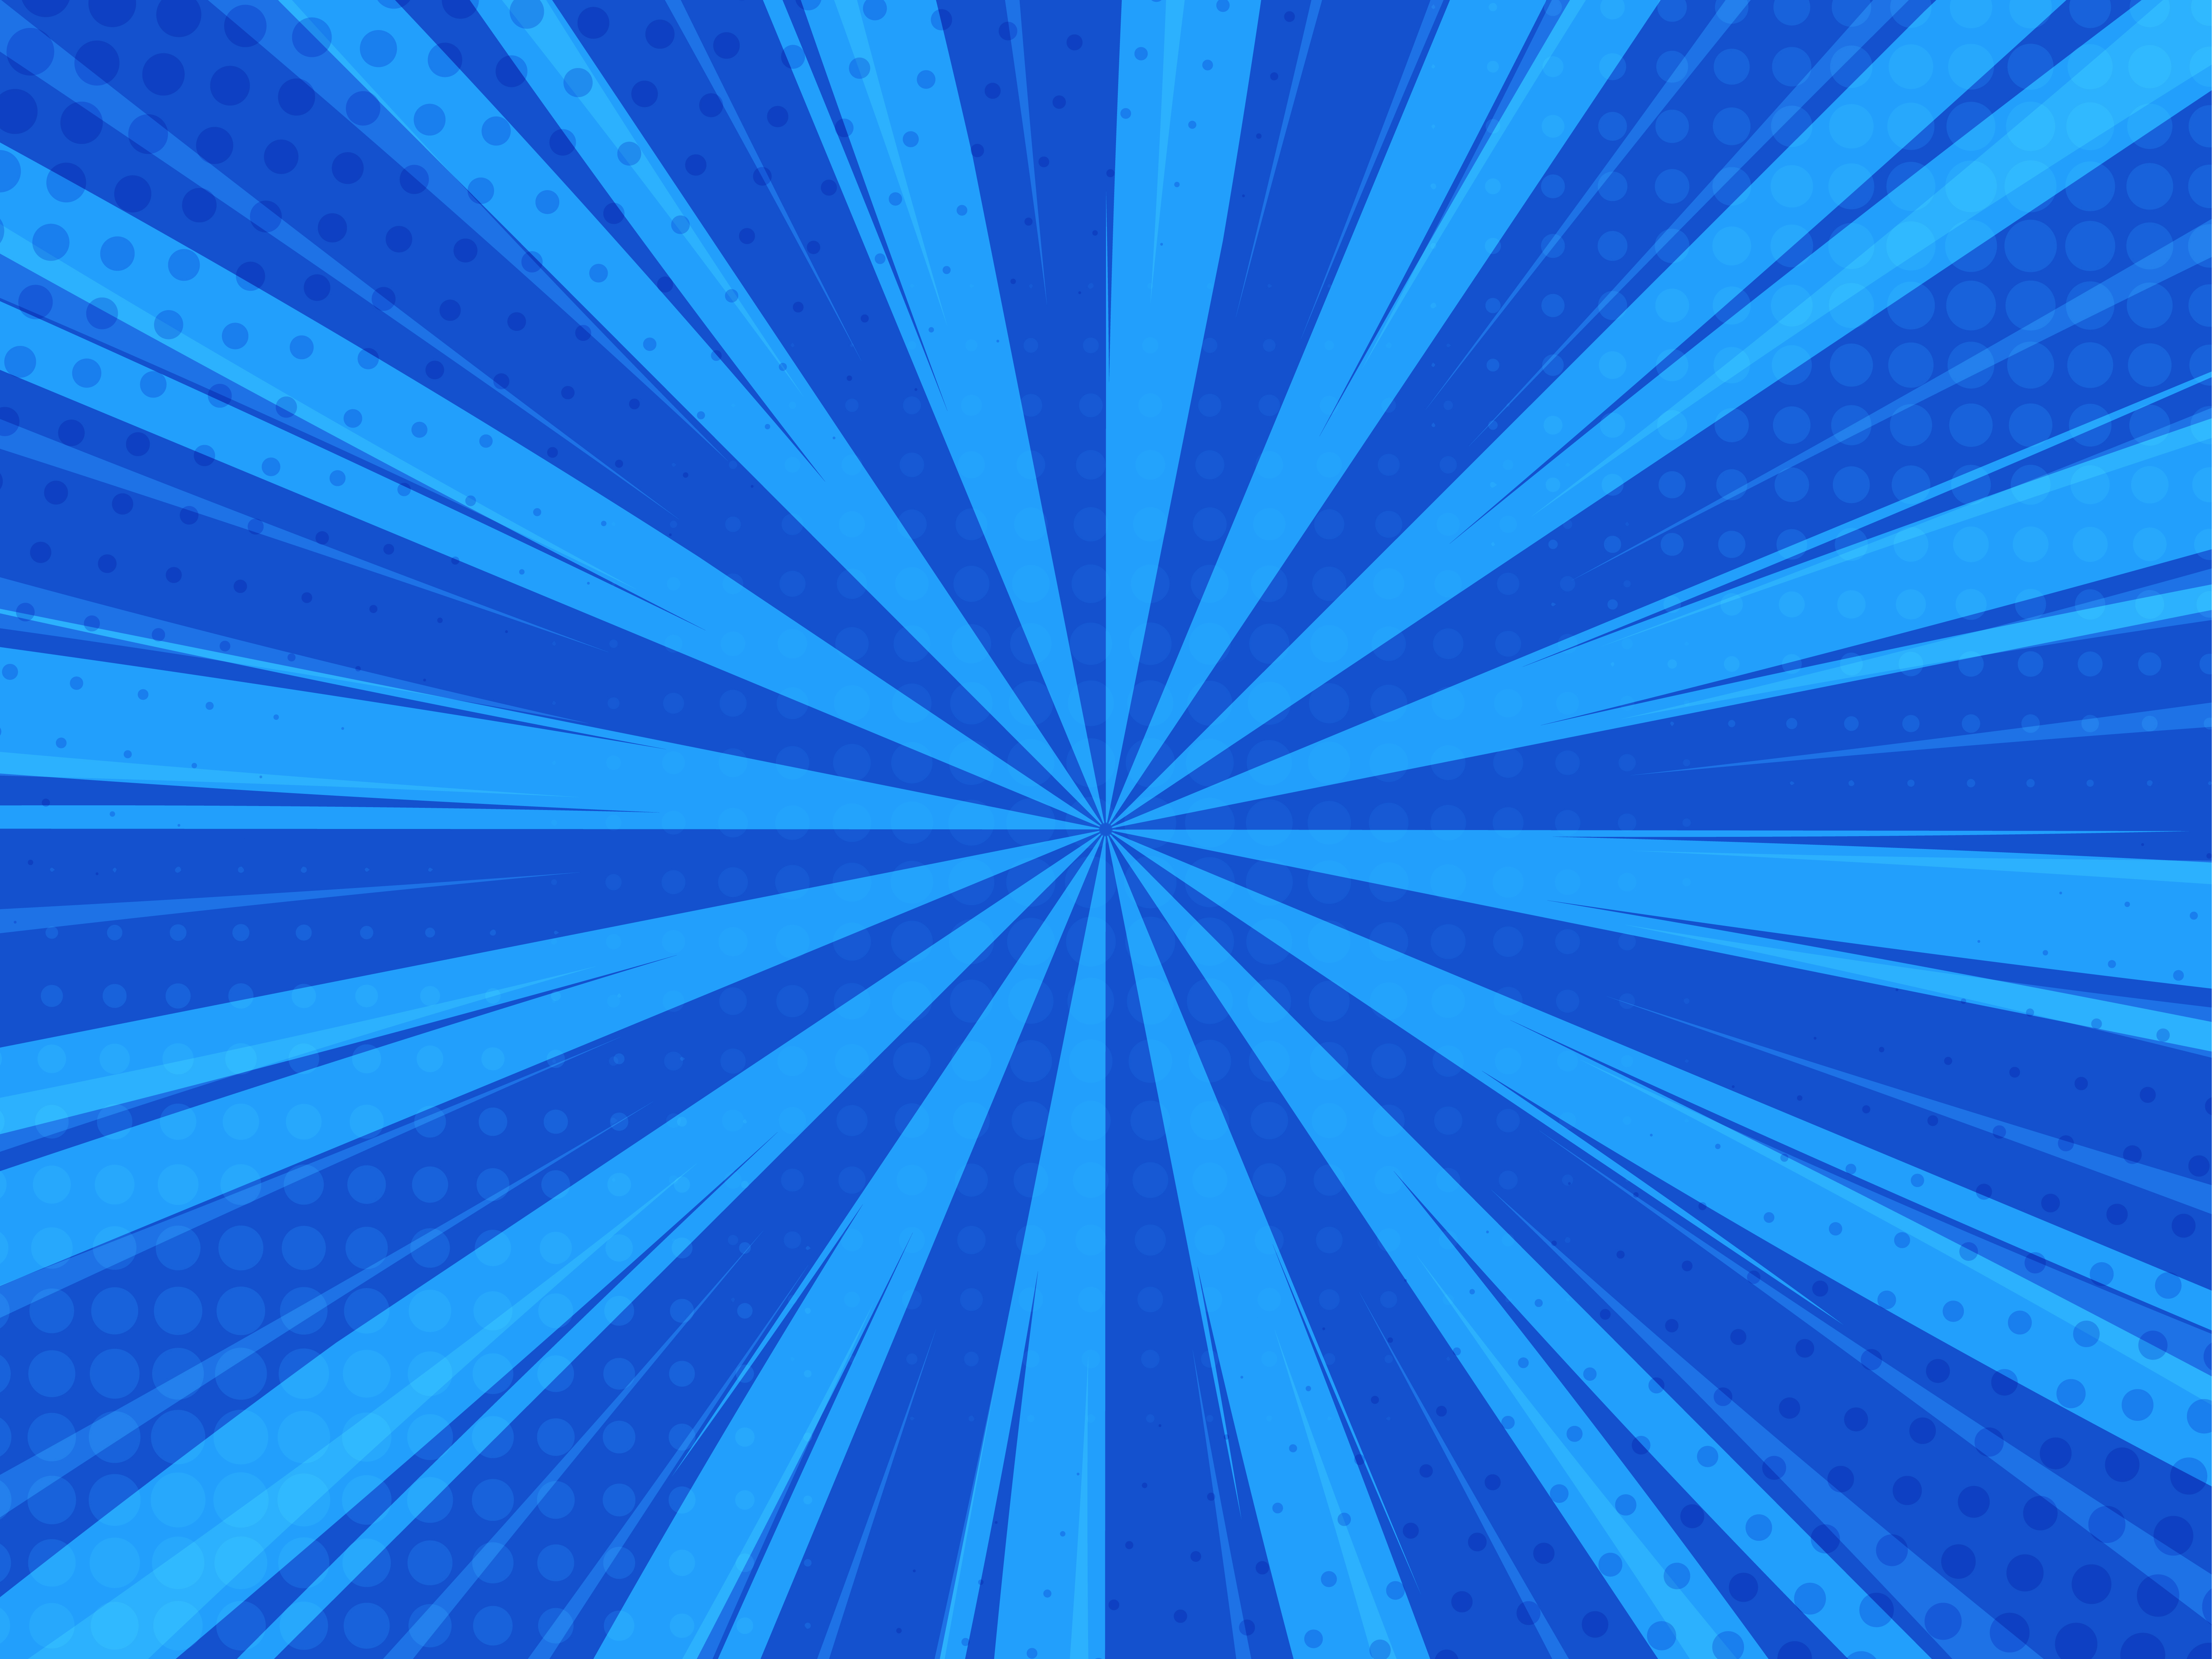 Blue Abstract Comic Cartoon Sunlight Background